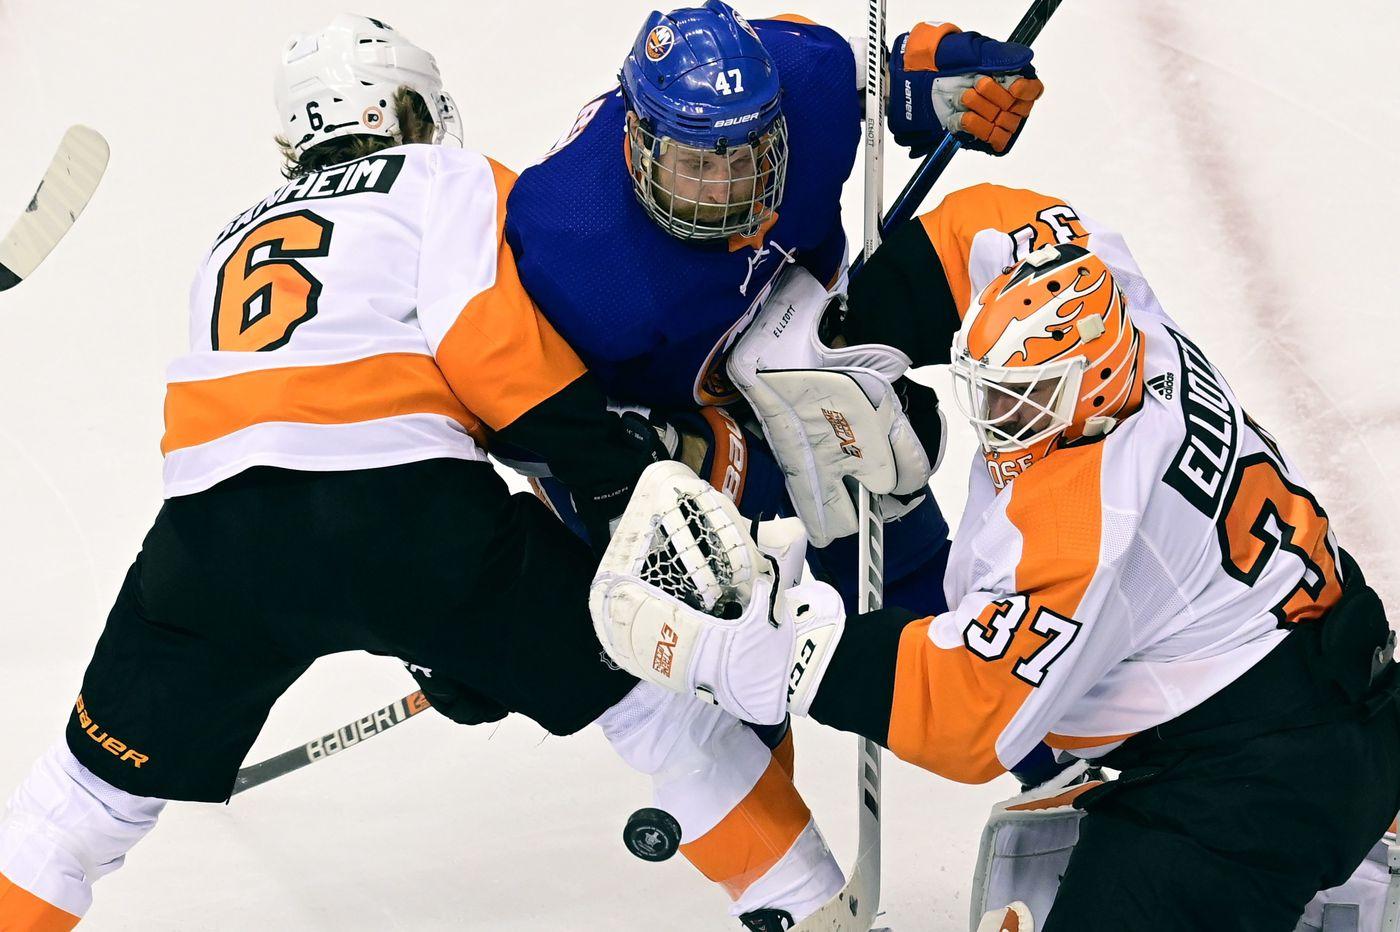 Third periods haunting Flyers; Oskar Lindblom working hard to return